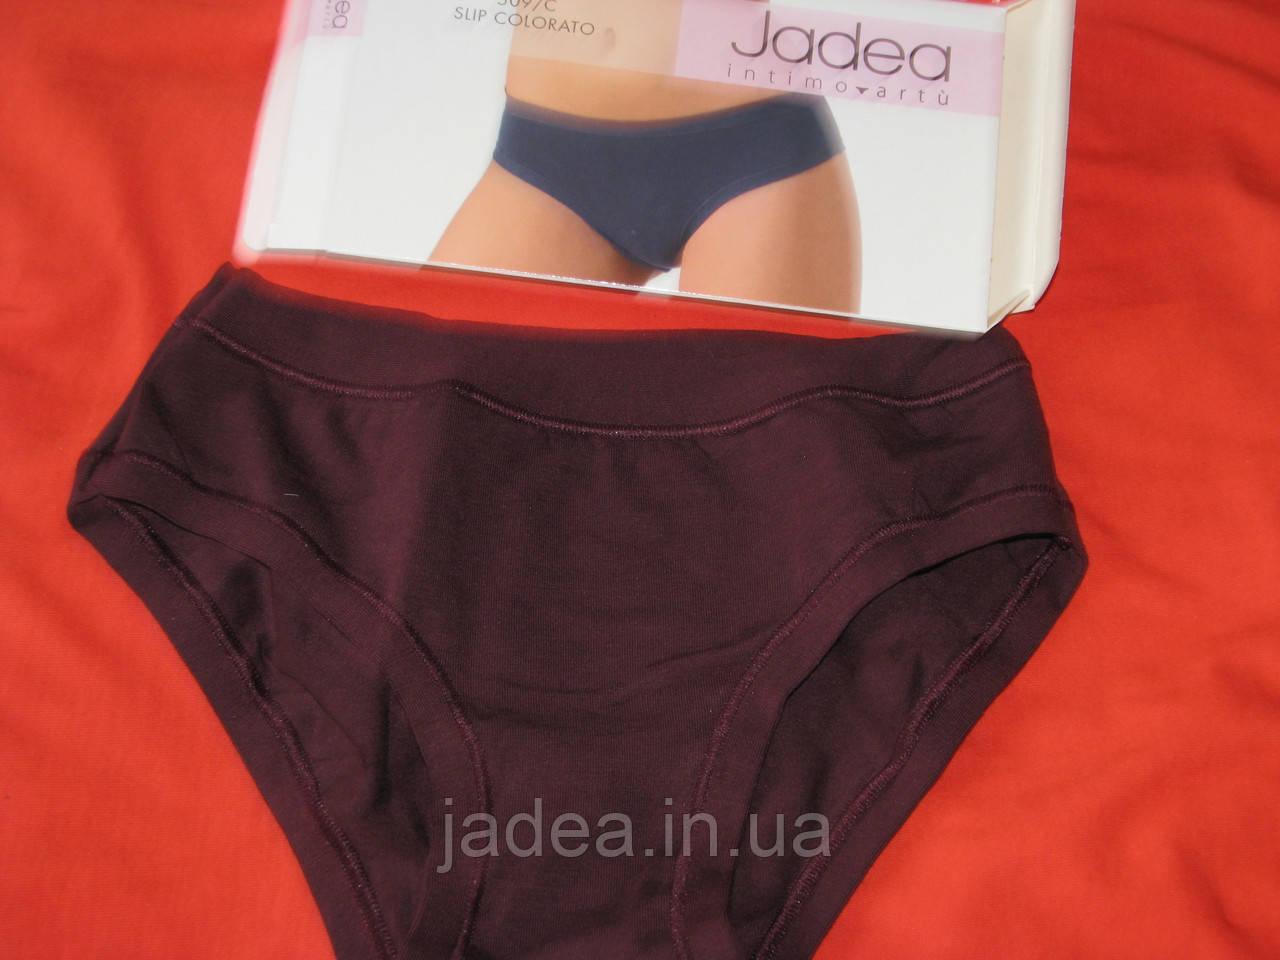 Jadea 509, трусики слип средняя посадка jadea 509  bordeaux, Италия